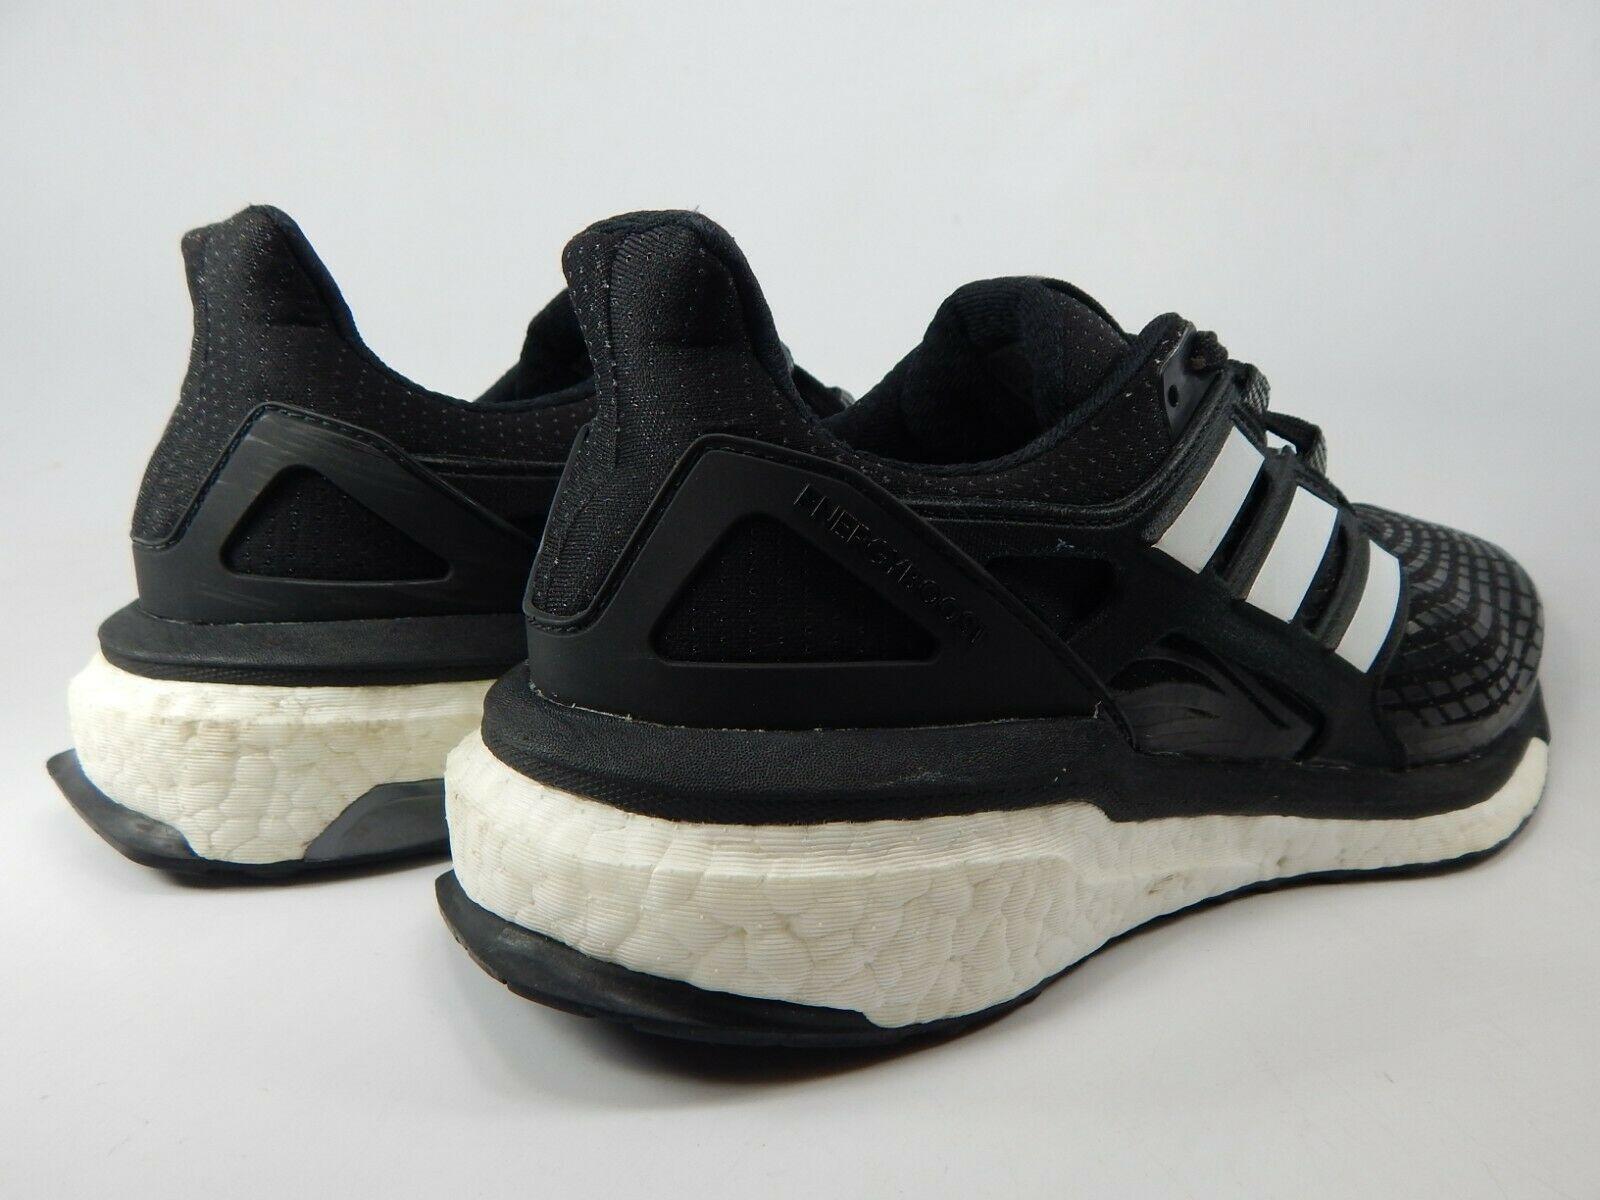 Adidas Energy Boost Misura USA 9.5 M (D) Eu 43 1/3 Uomo Scarpe da Corsa Nero image 5